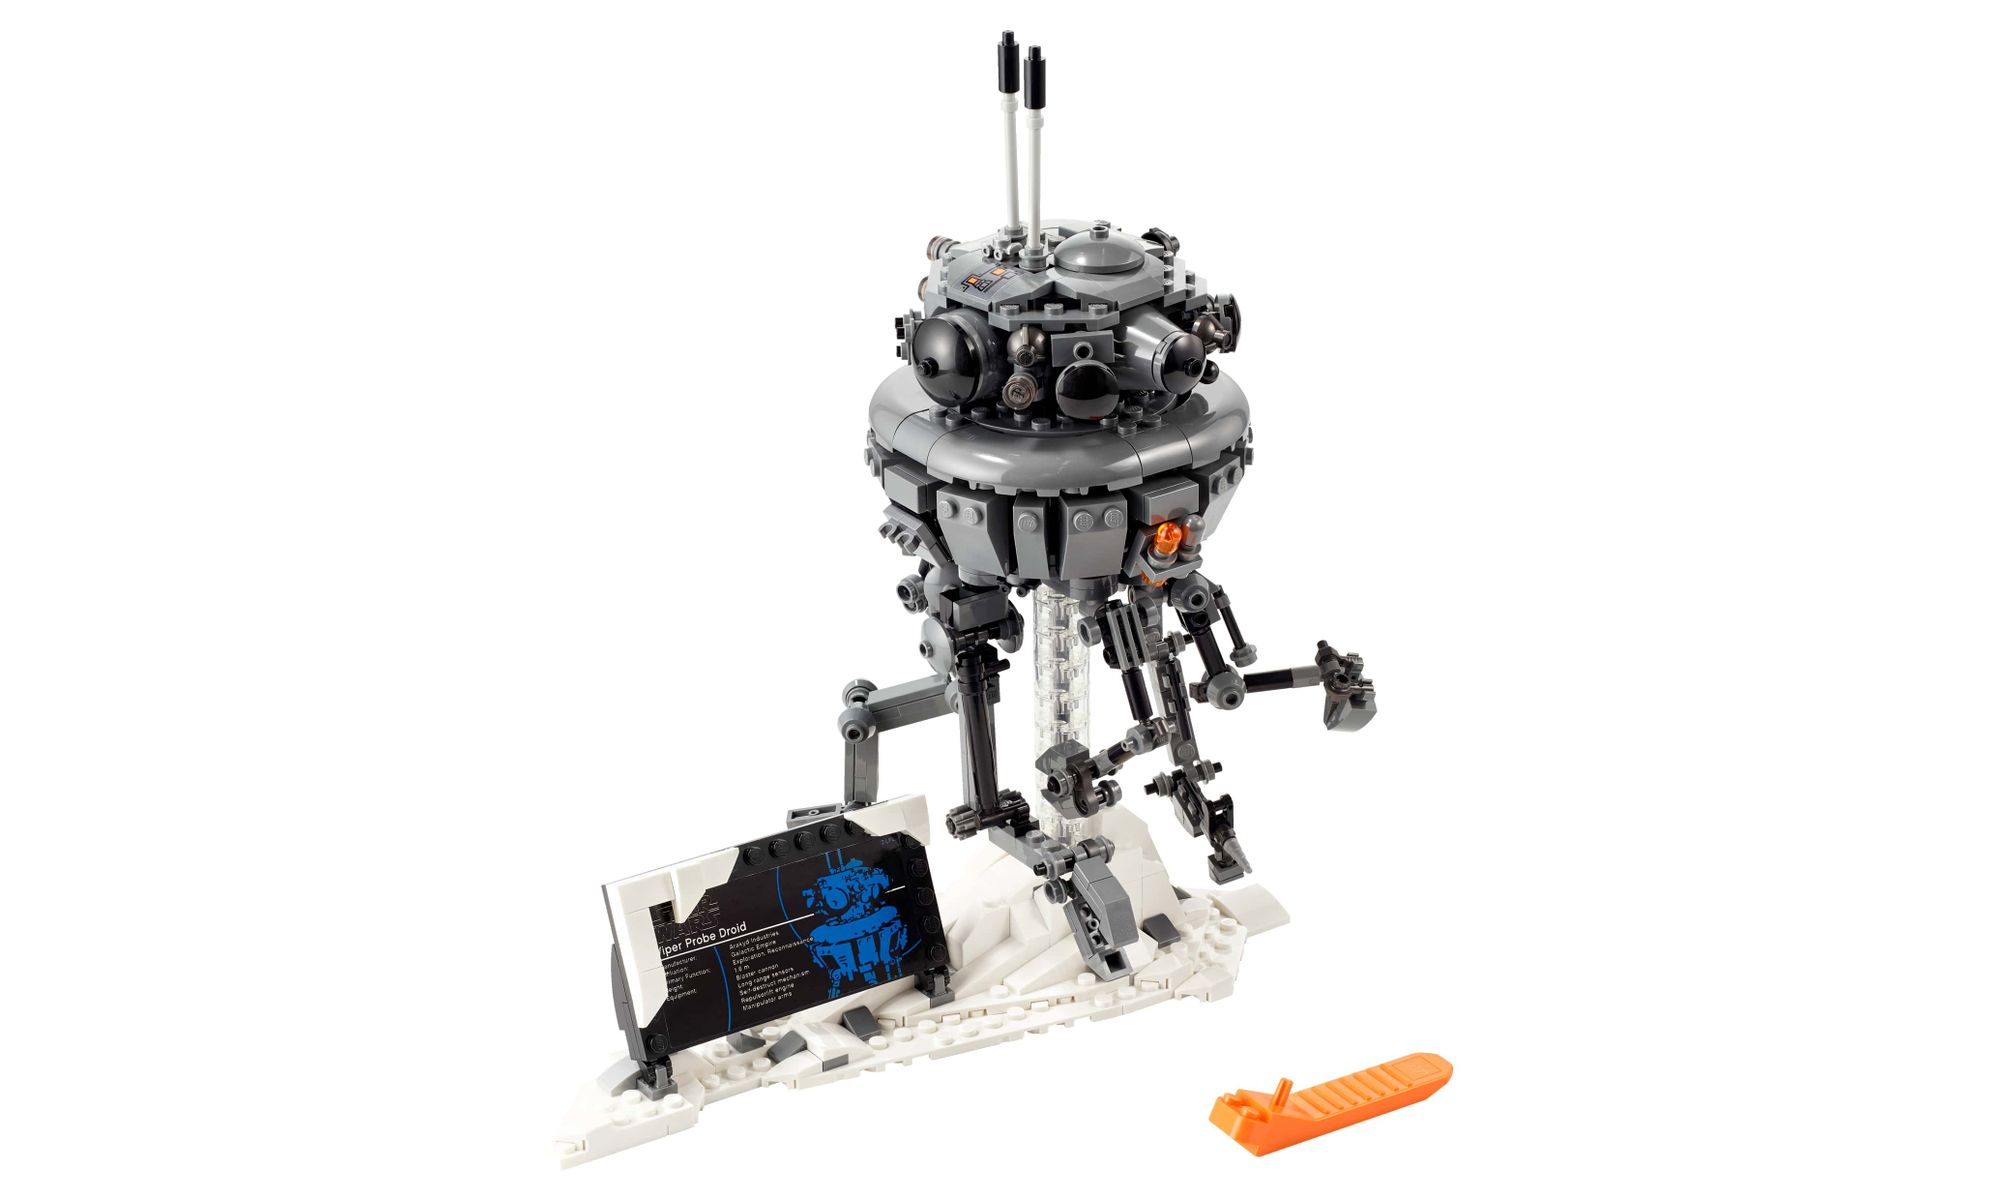 LEGO Star Wars Imperial Probe Droid